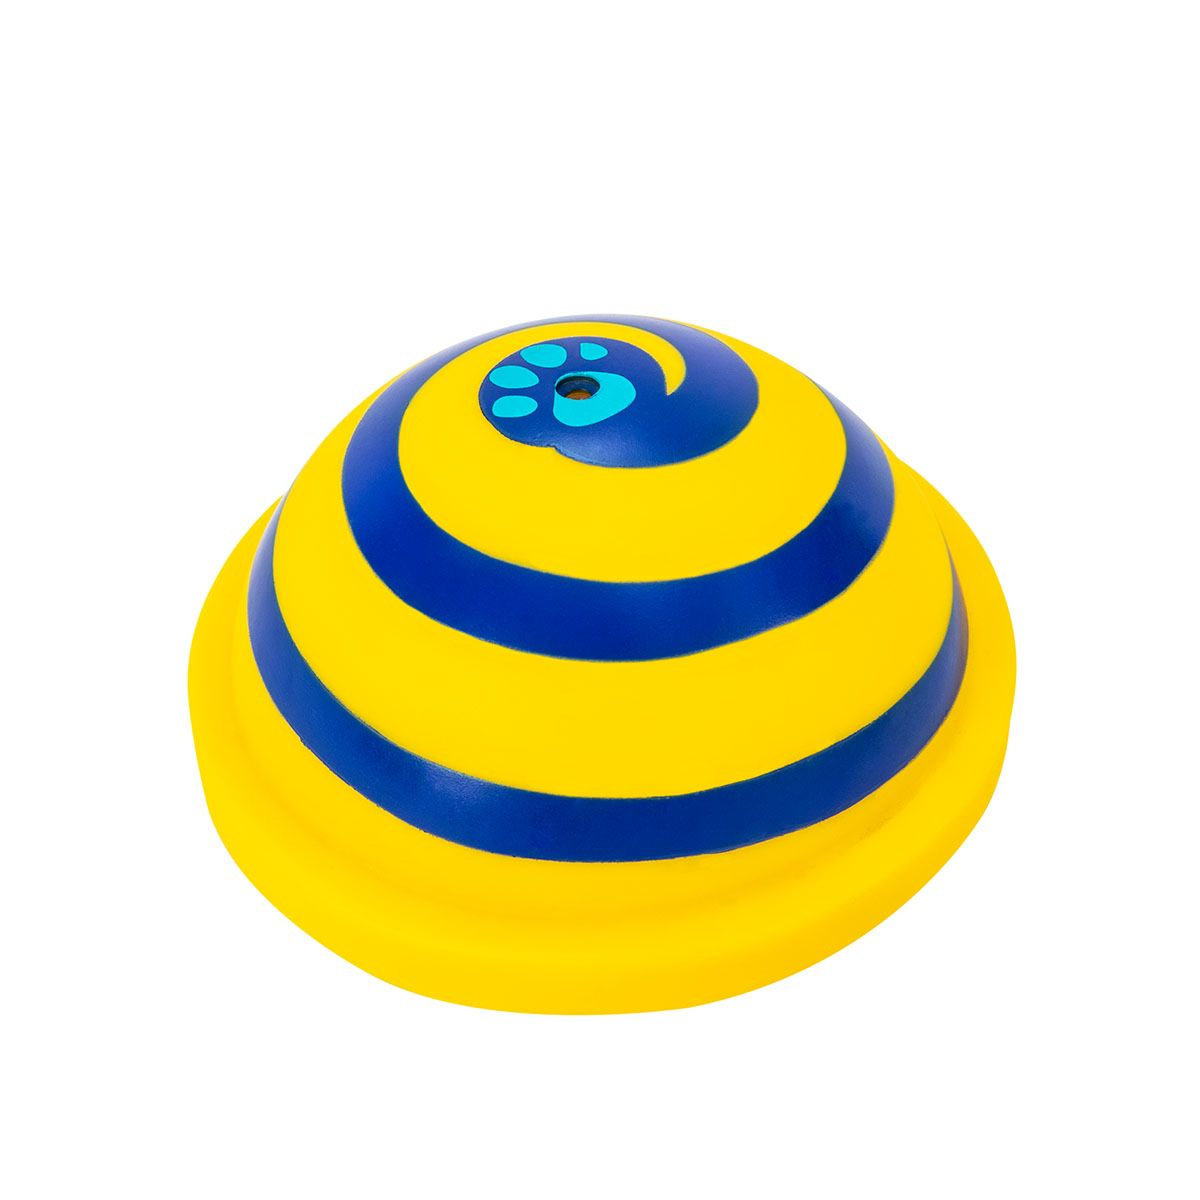 JML Woof Glider - Yellow & Blue